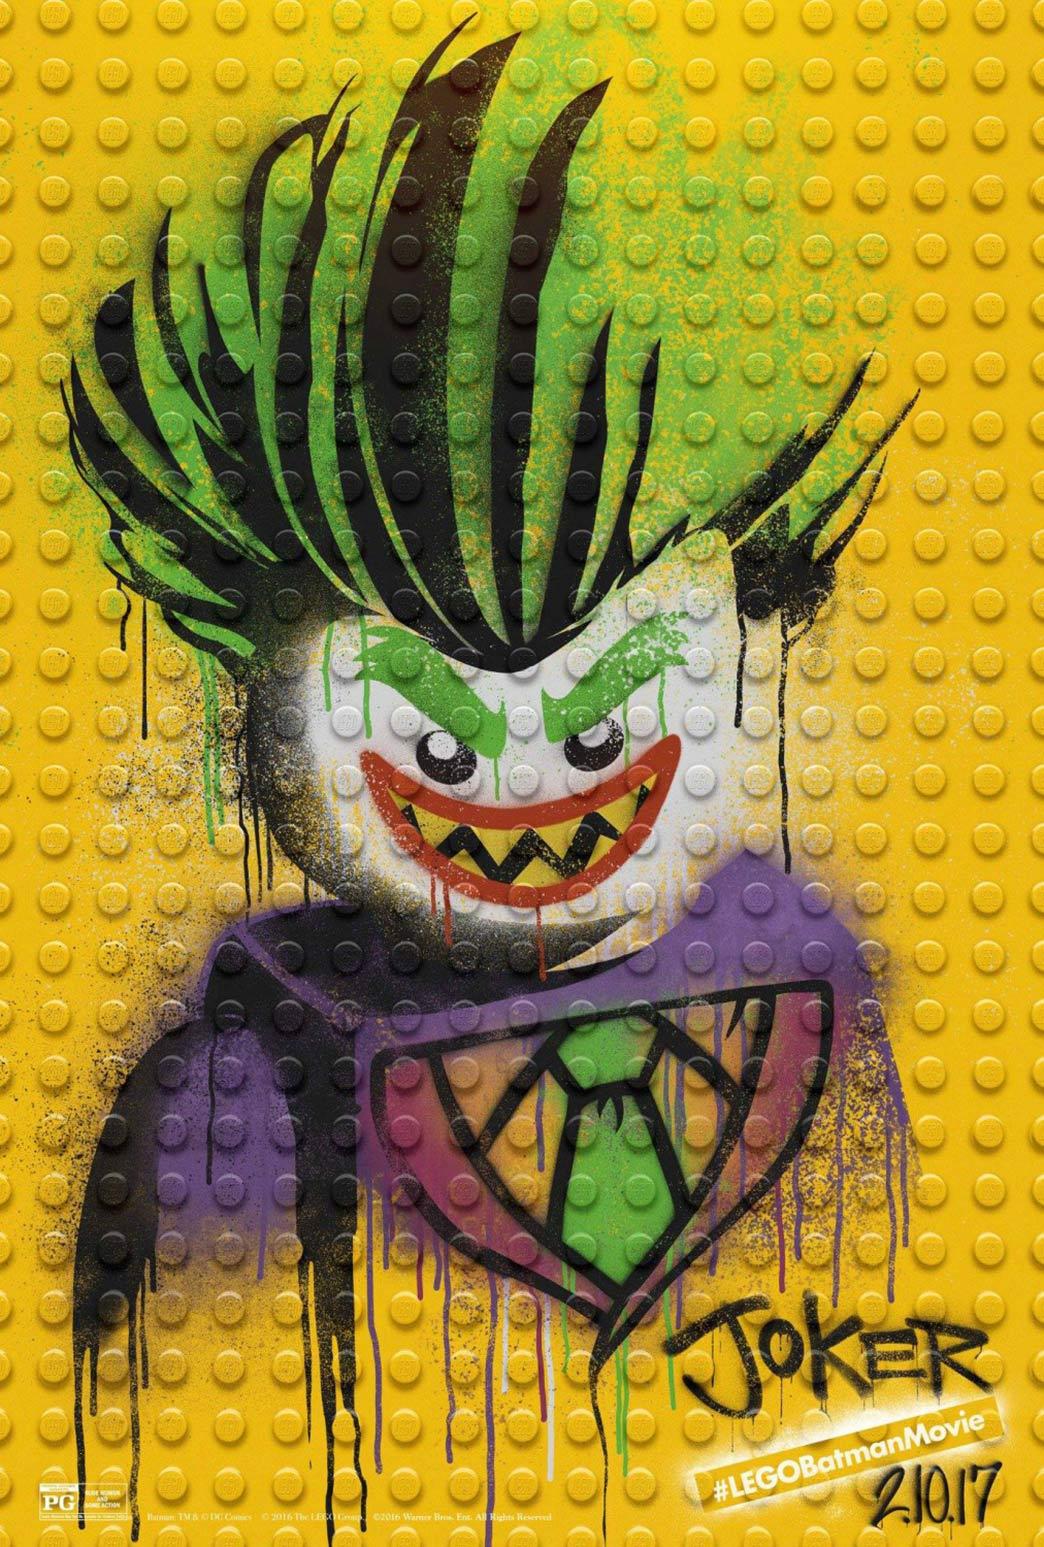 The Lego Batman Movie Poster #16